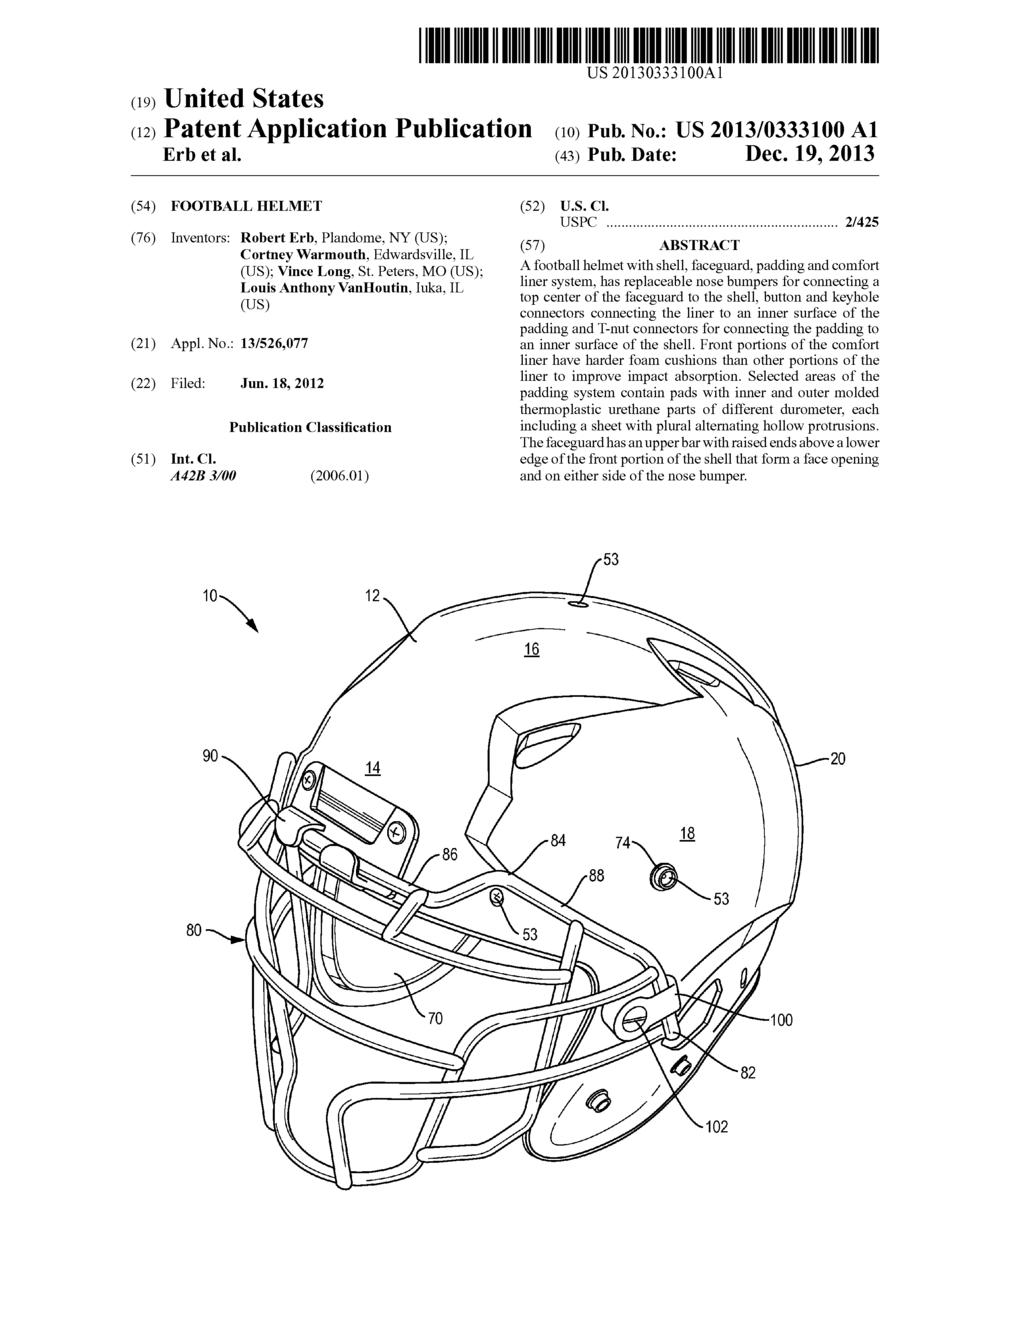 football helmet diagram schematic and image 01 rh patentsencyclopedia com